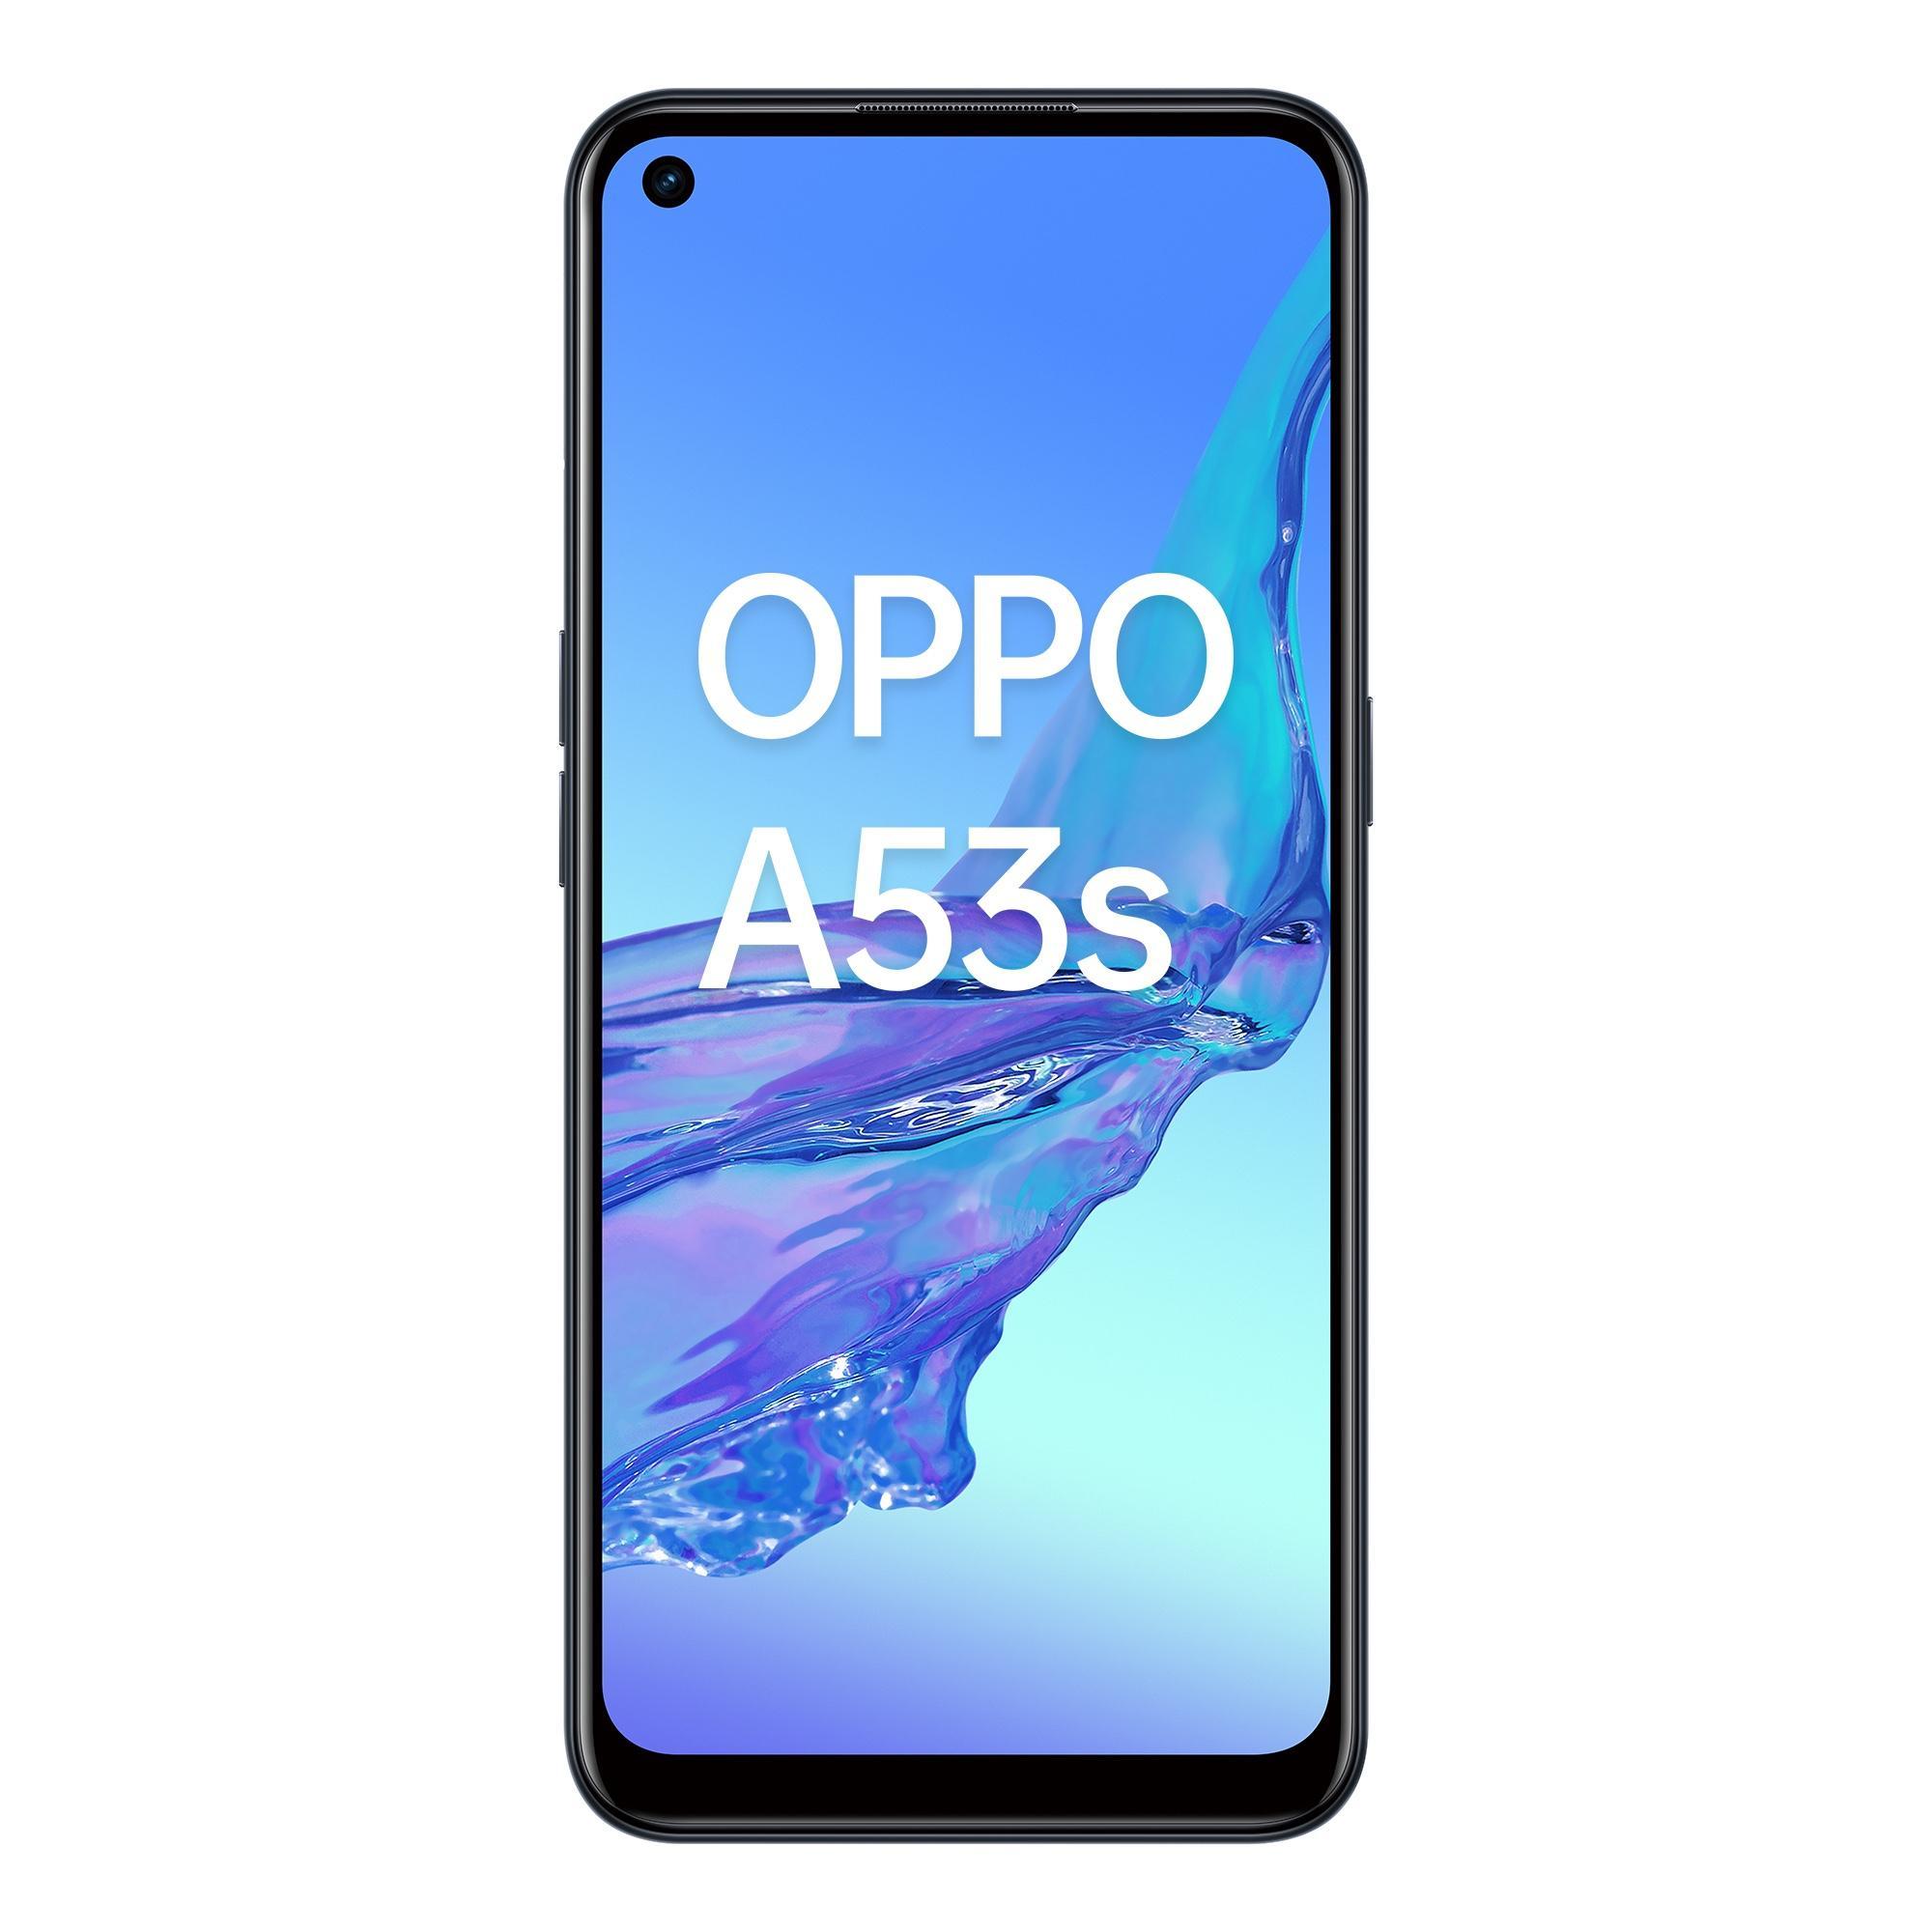 "Oppo A53s Smartphone, 186g, Display 6.5"" HD+ LCD, 3 Fotocamere 13MP, RAM 4GB + ROM 128GB Espandibile, Batteria 5000mAh, Ricarica Rapida, Dual Sim, [Versione Italiana], Electric Black"